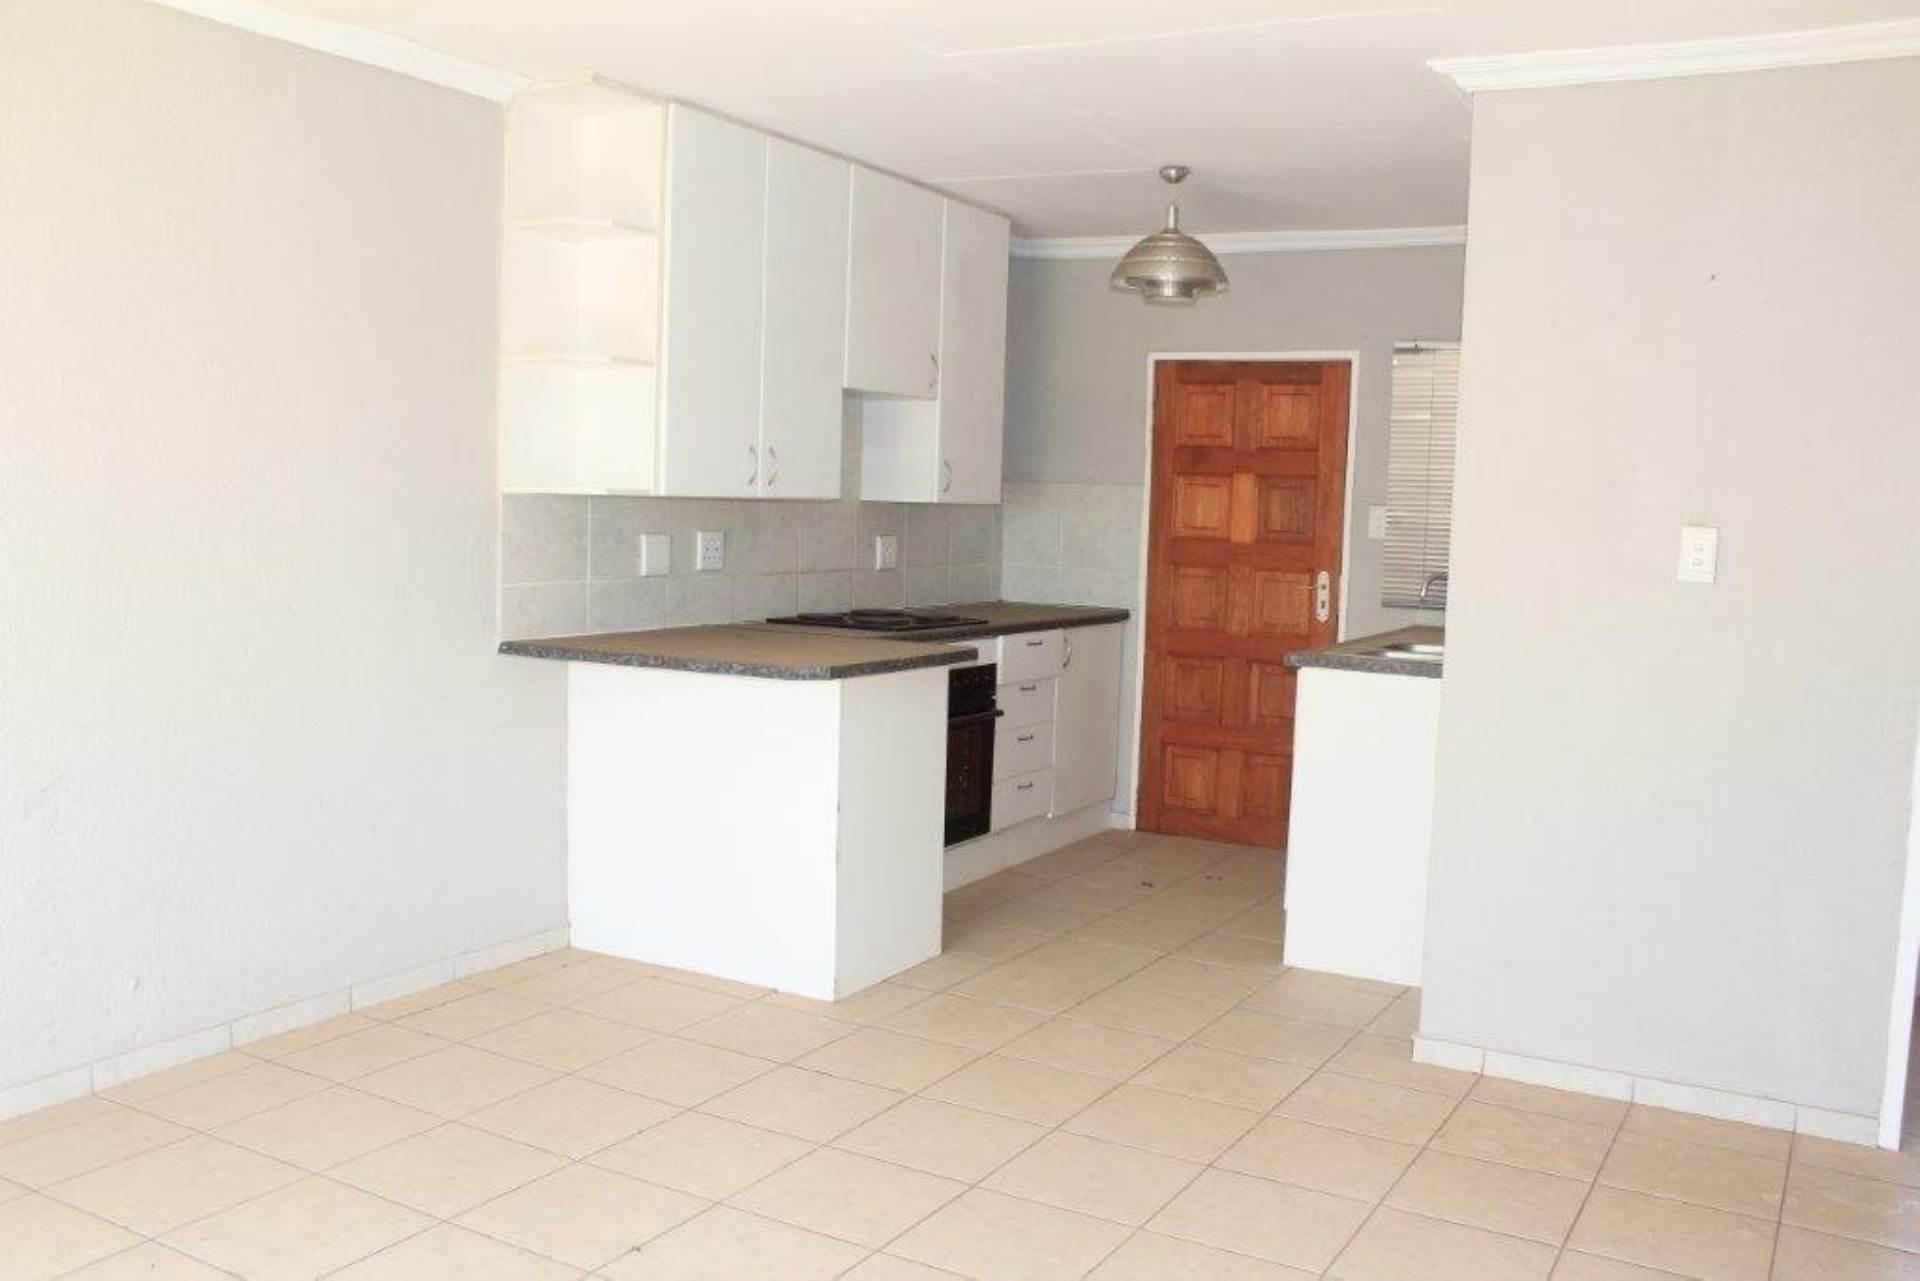 Akasia, Clarina Property  | Houses For Sale Clarina, CLARINA, Apartment 2 bedrooms property for sale Price:399,000